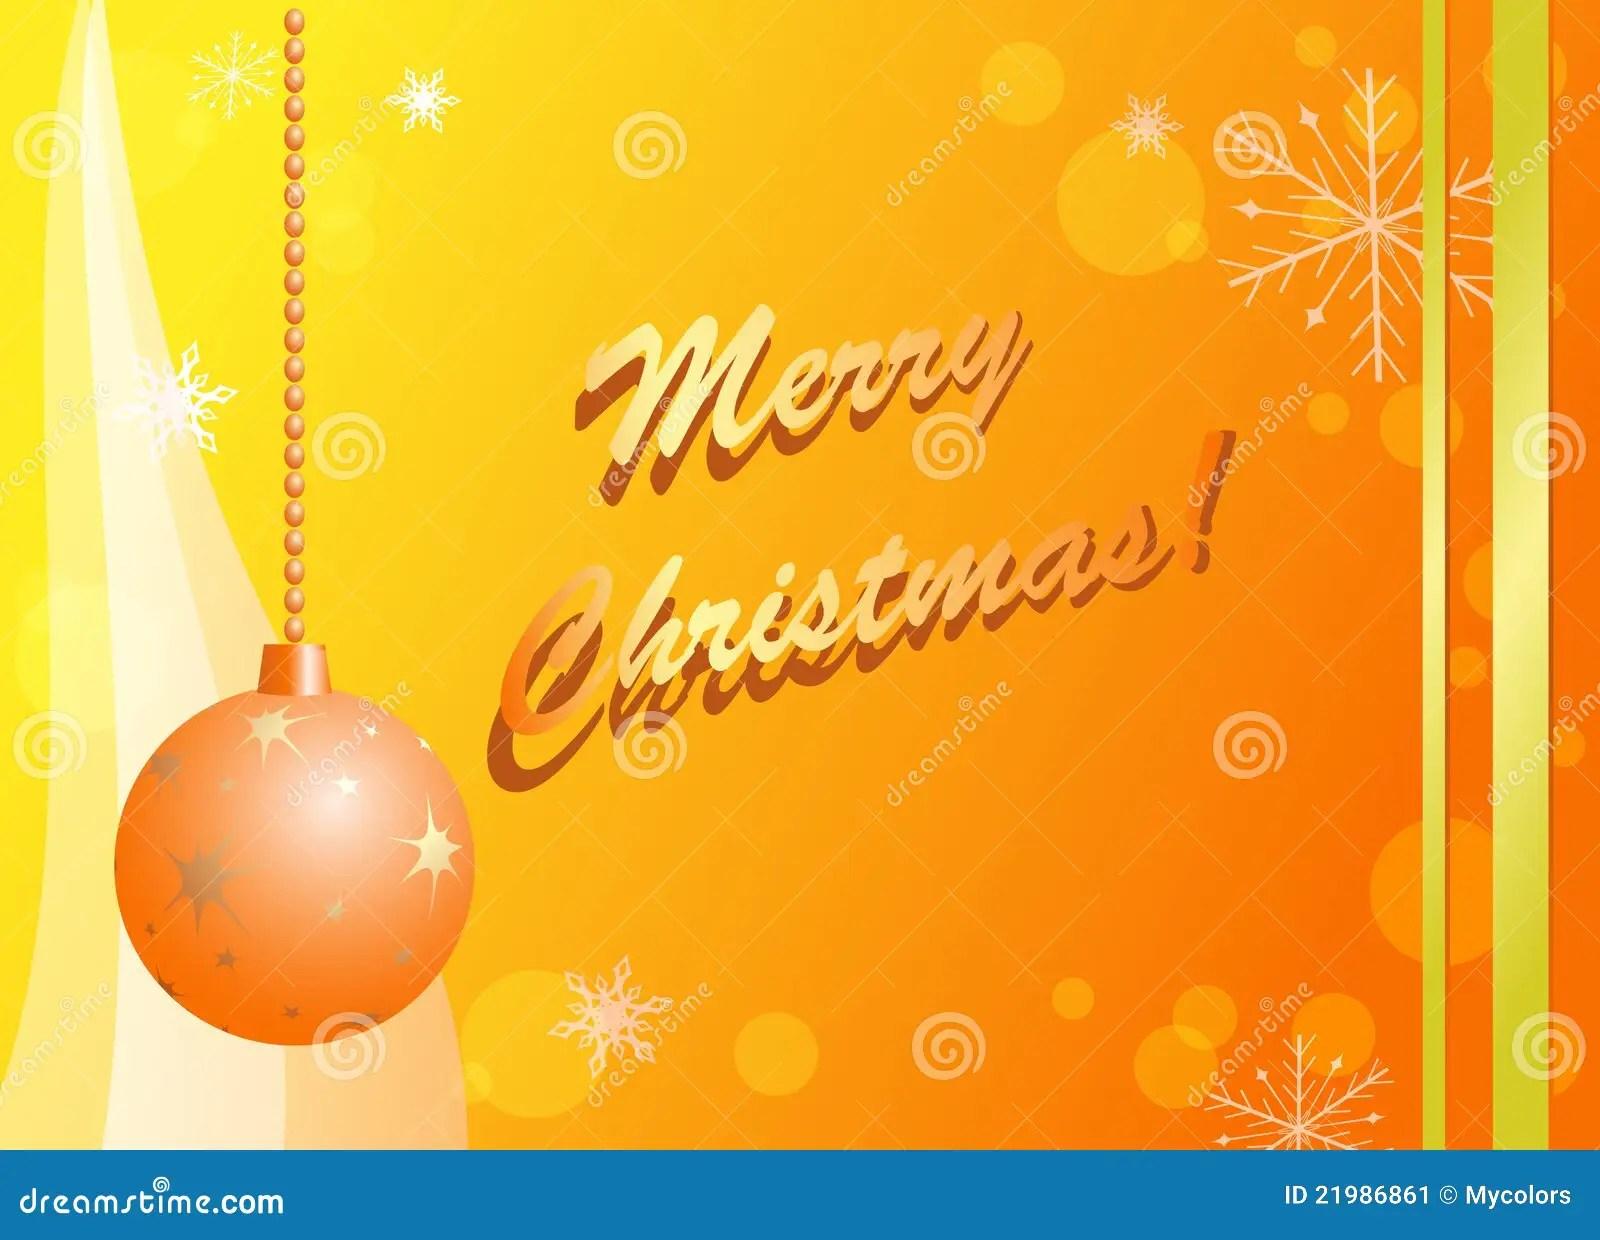 Yellow And Orange Vector Christmas Card Stock Vector